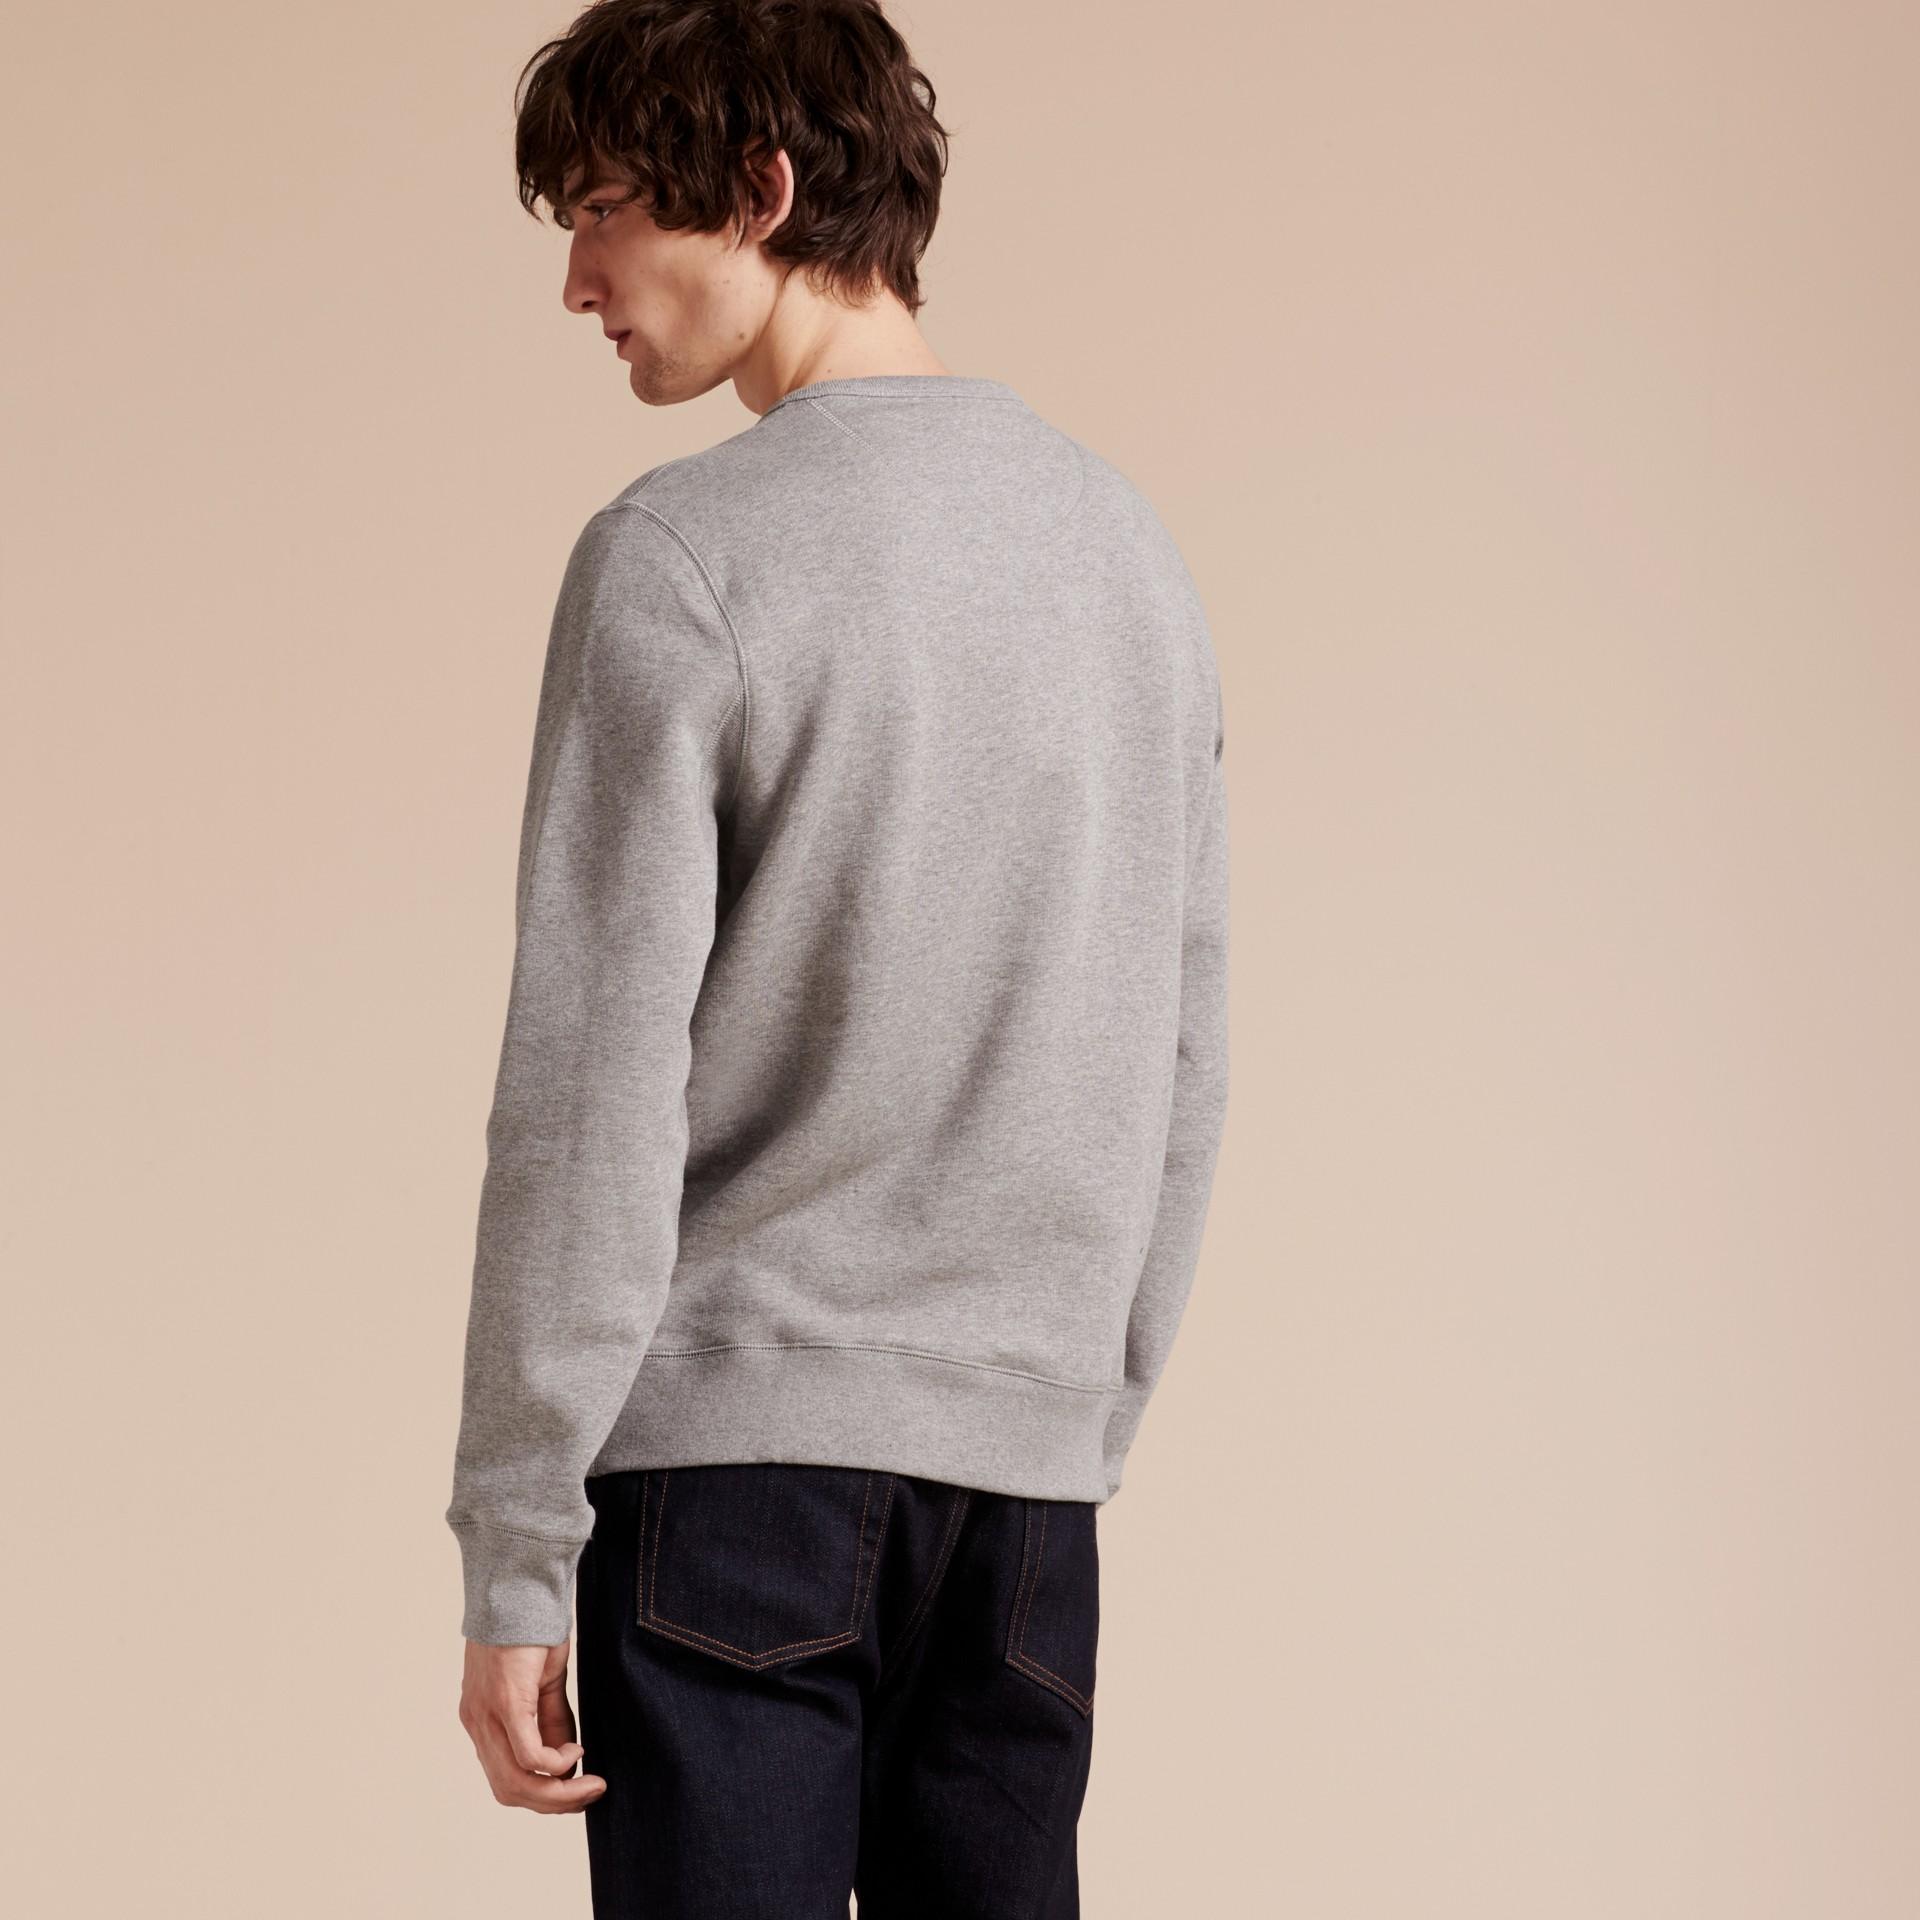 Cotton Blend Jersey Sweatshirt Pale Grey Melange - gallery image 3